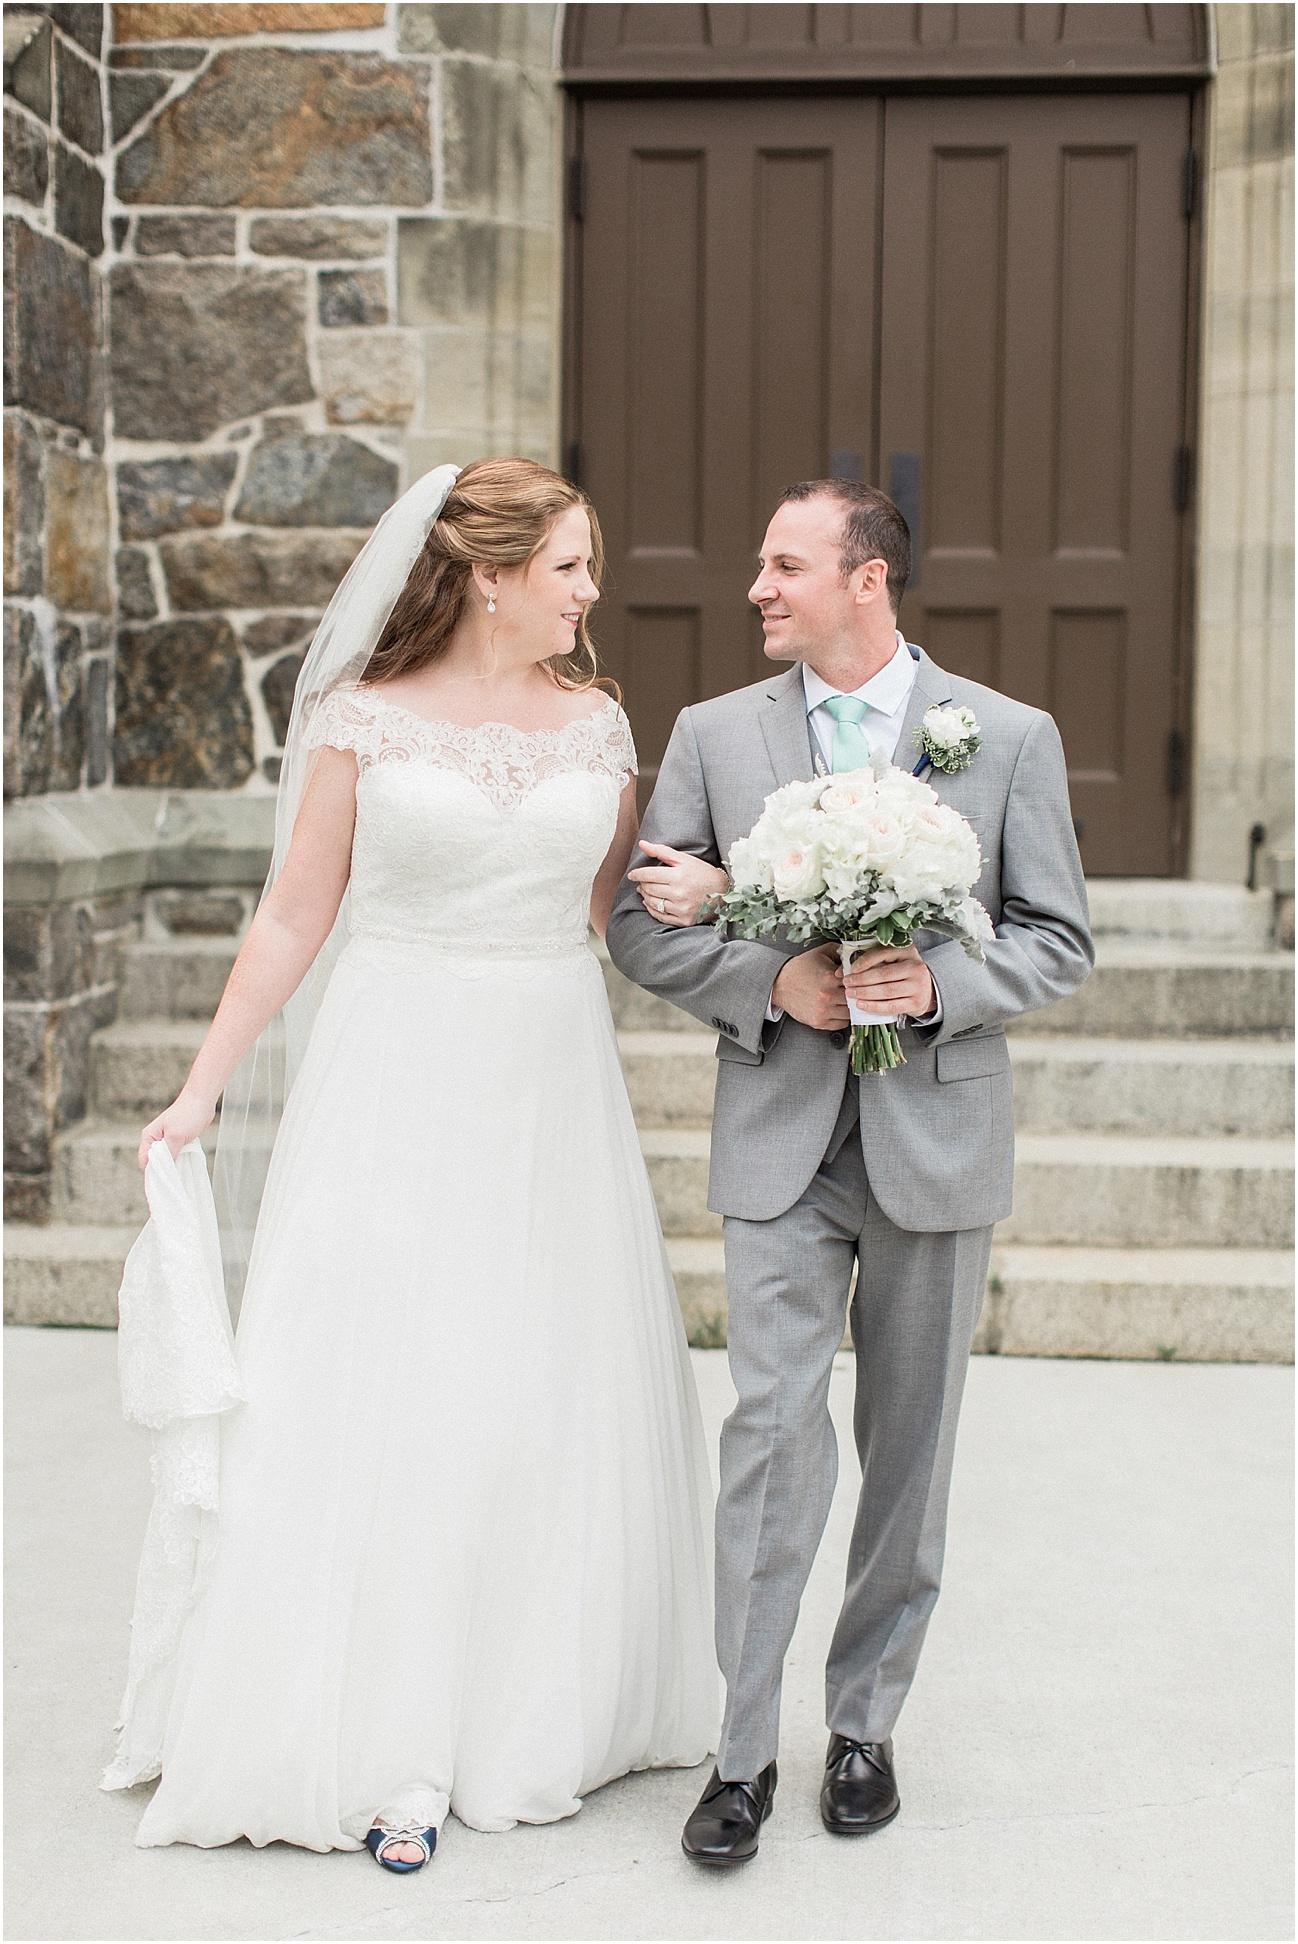 jaclyn_adam_st_ann_brendans_dorchester_southie_castle_bride_groom_venezia_waterfront__cape_cod_boston_wedding_photographer_meredith_jane_photography_photo_0900.jpg